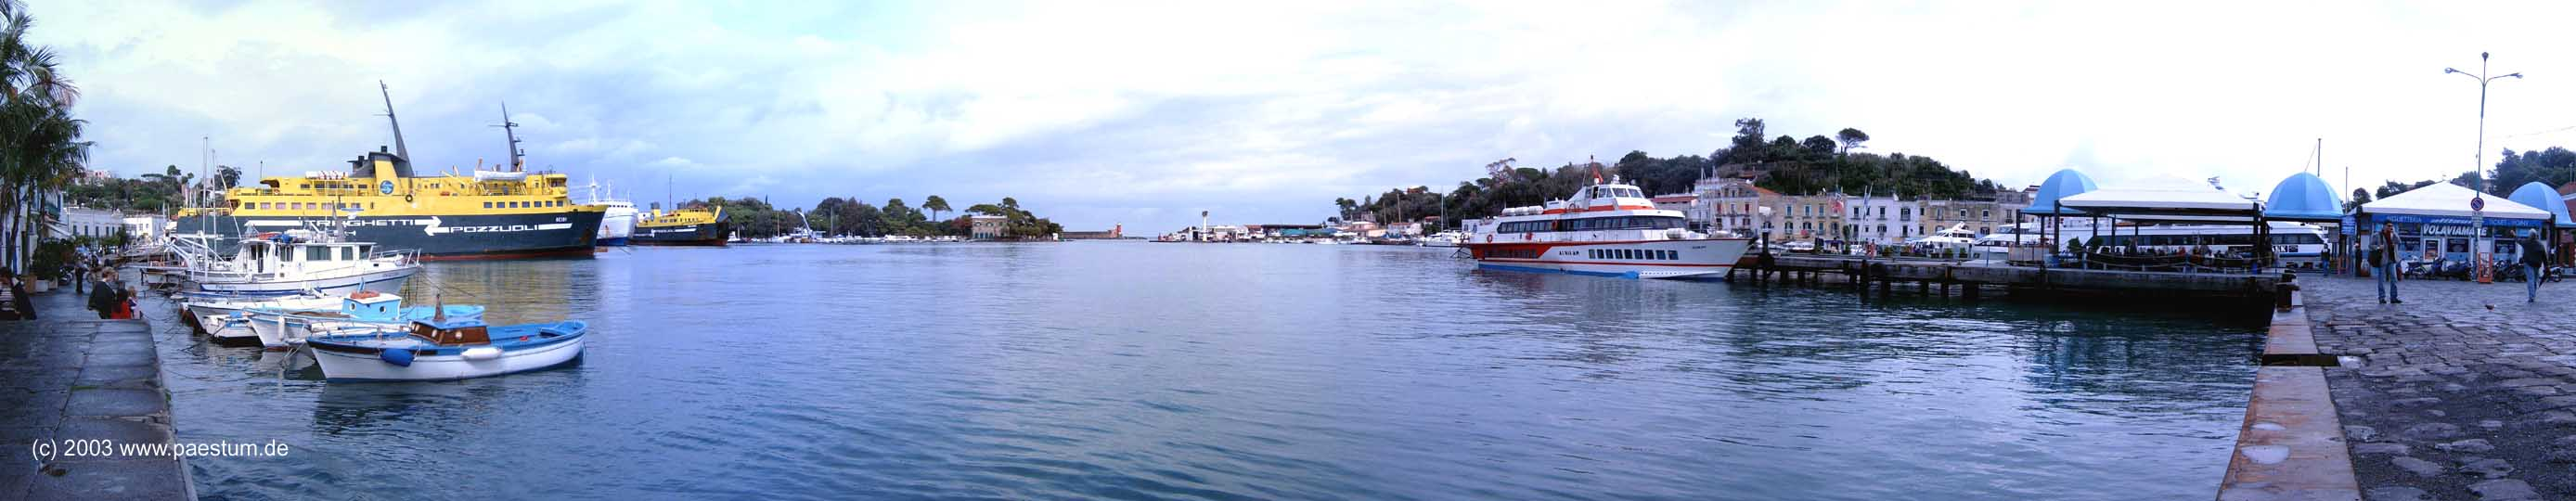 Panorama Ischia Porto - Hafen